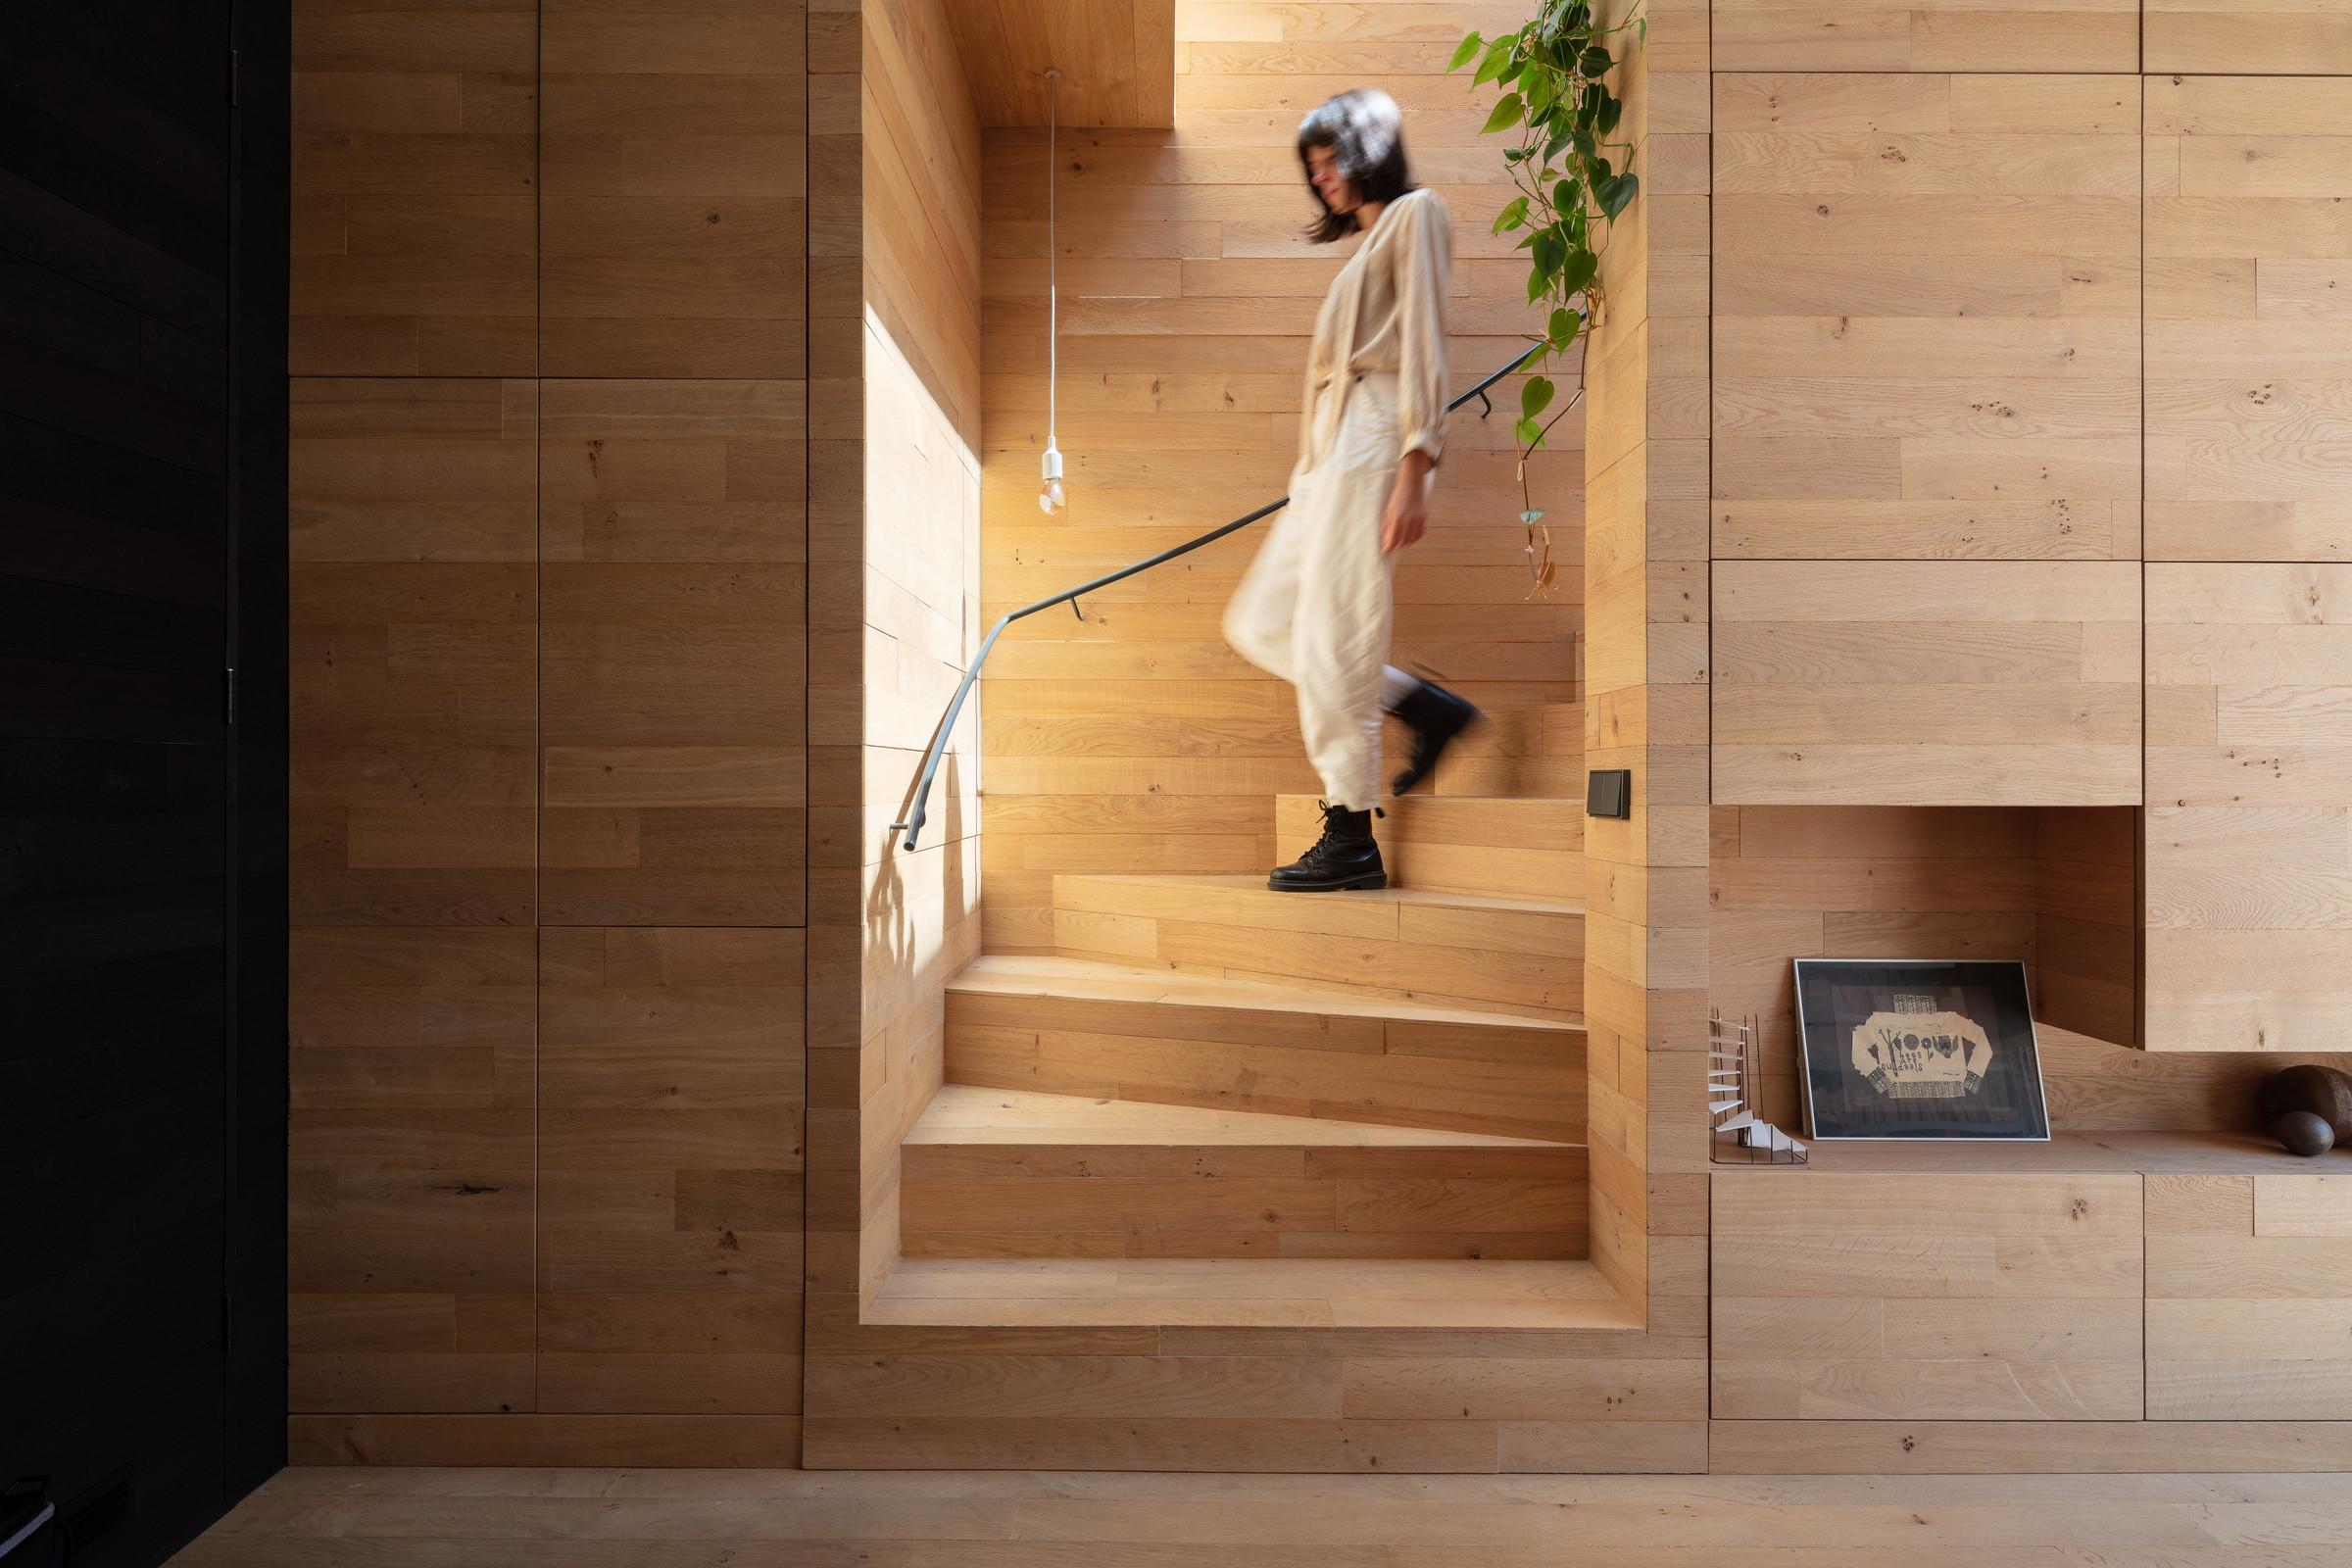 La madera es el material protagonista